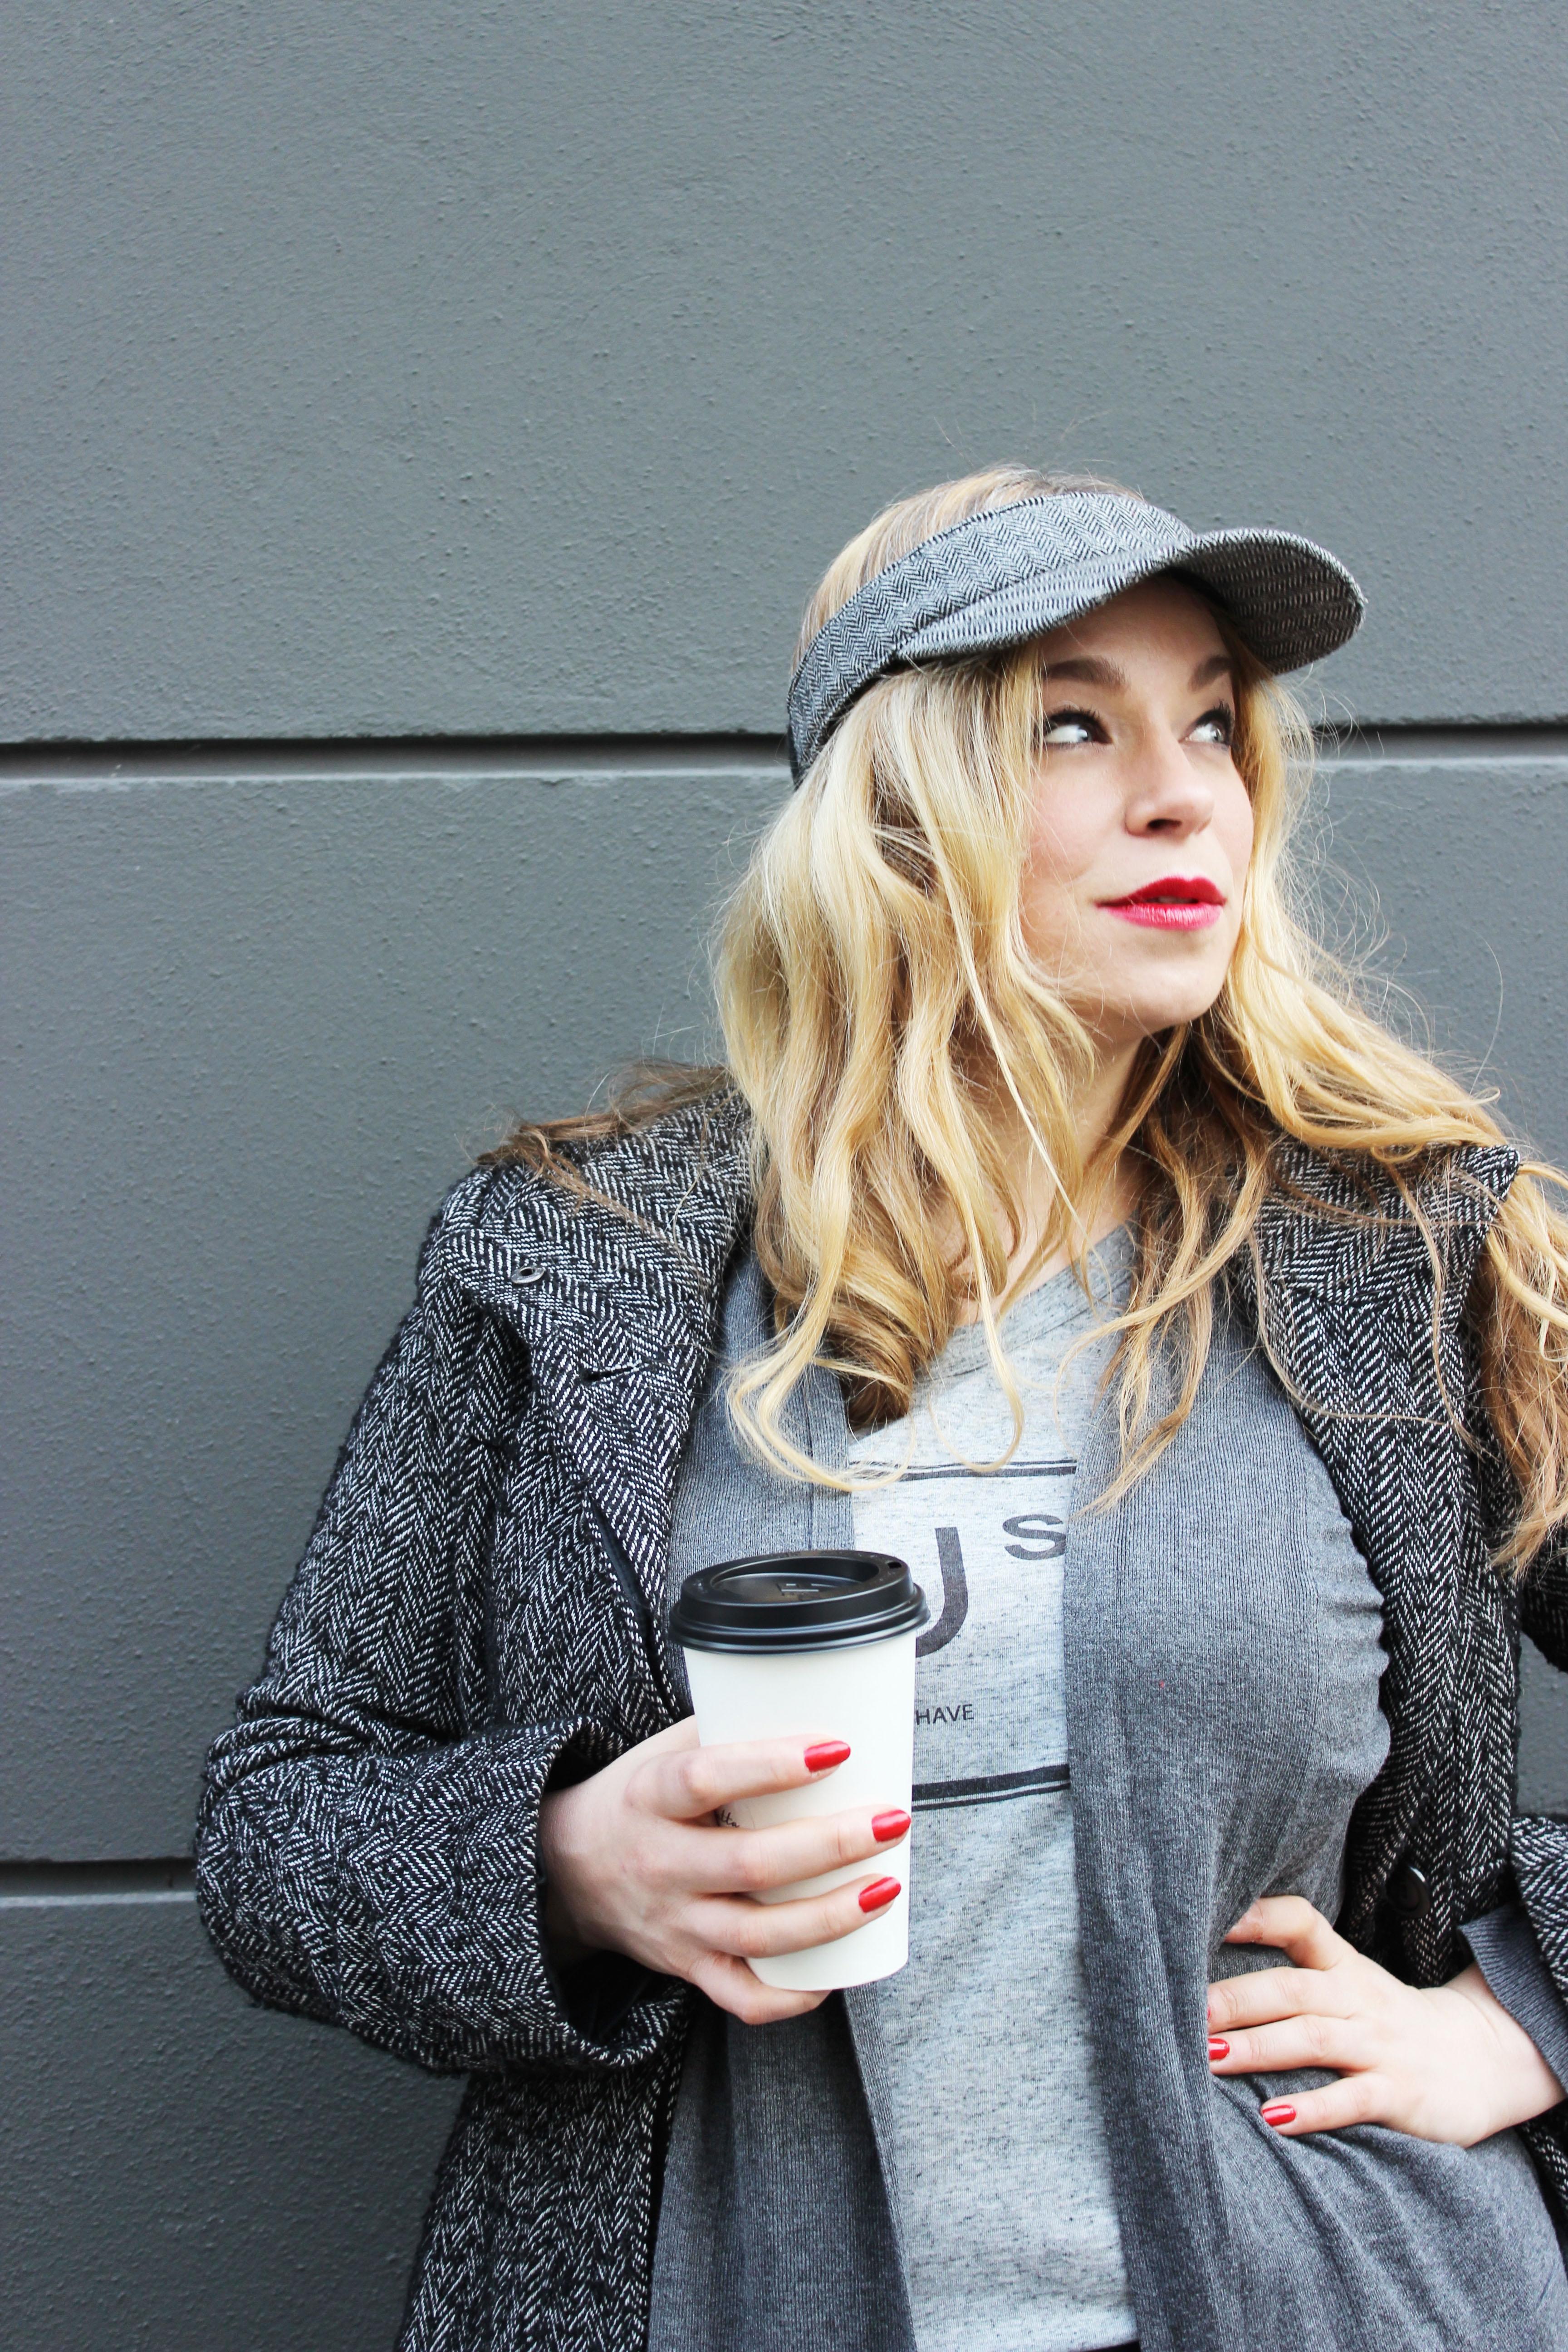 Deutscheblogger-Megabambi-Caterina-pogorzelski-Plusmodel-Schauspielerin-Tv-Moderatorin-curvyblogger-mollig